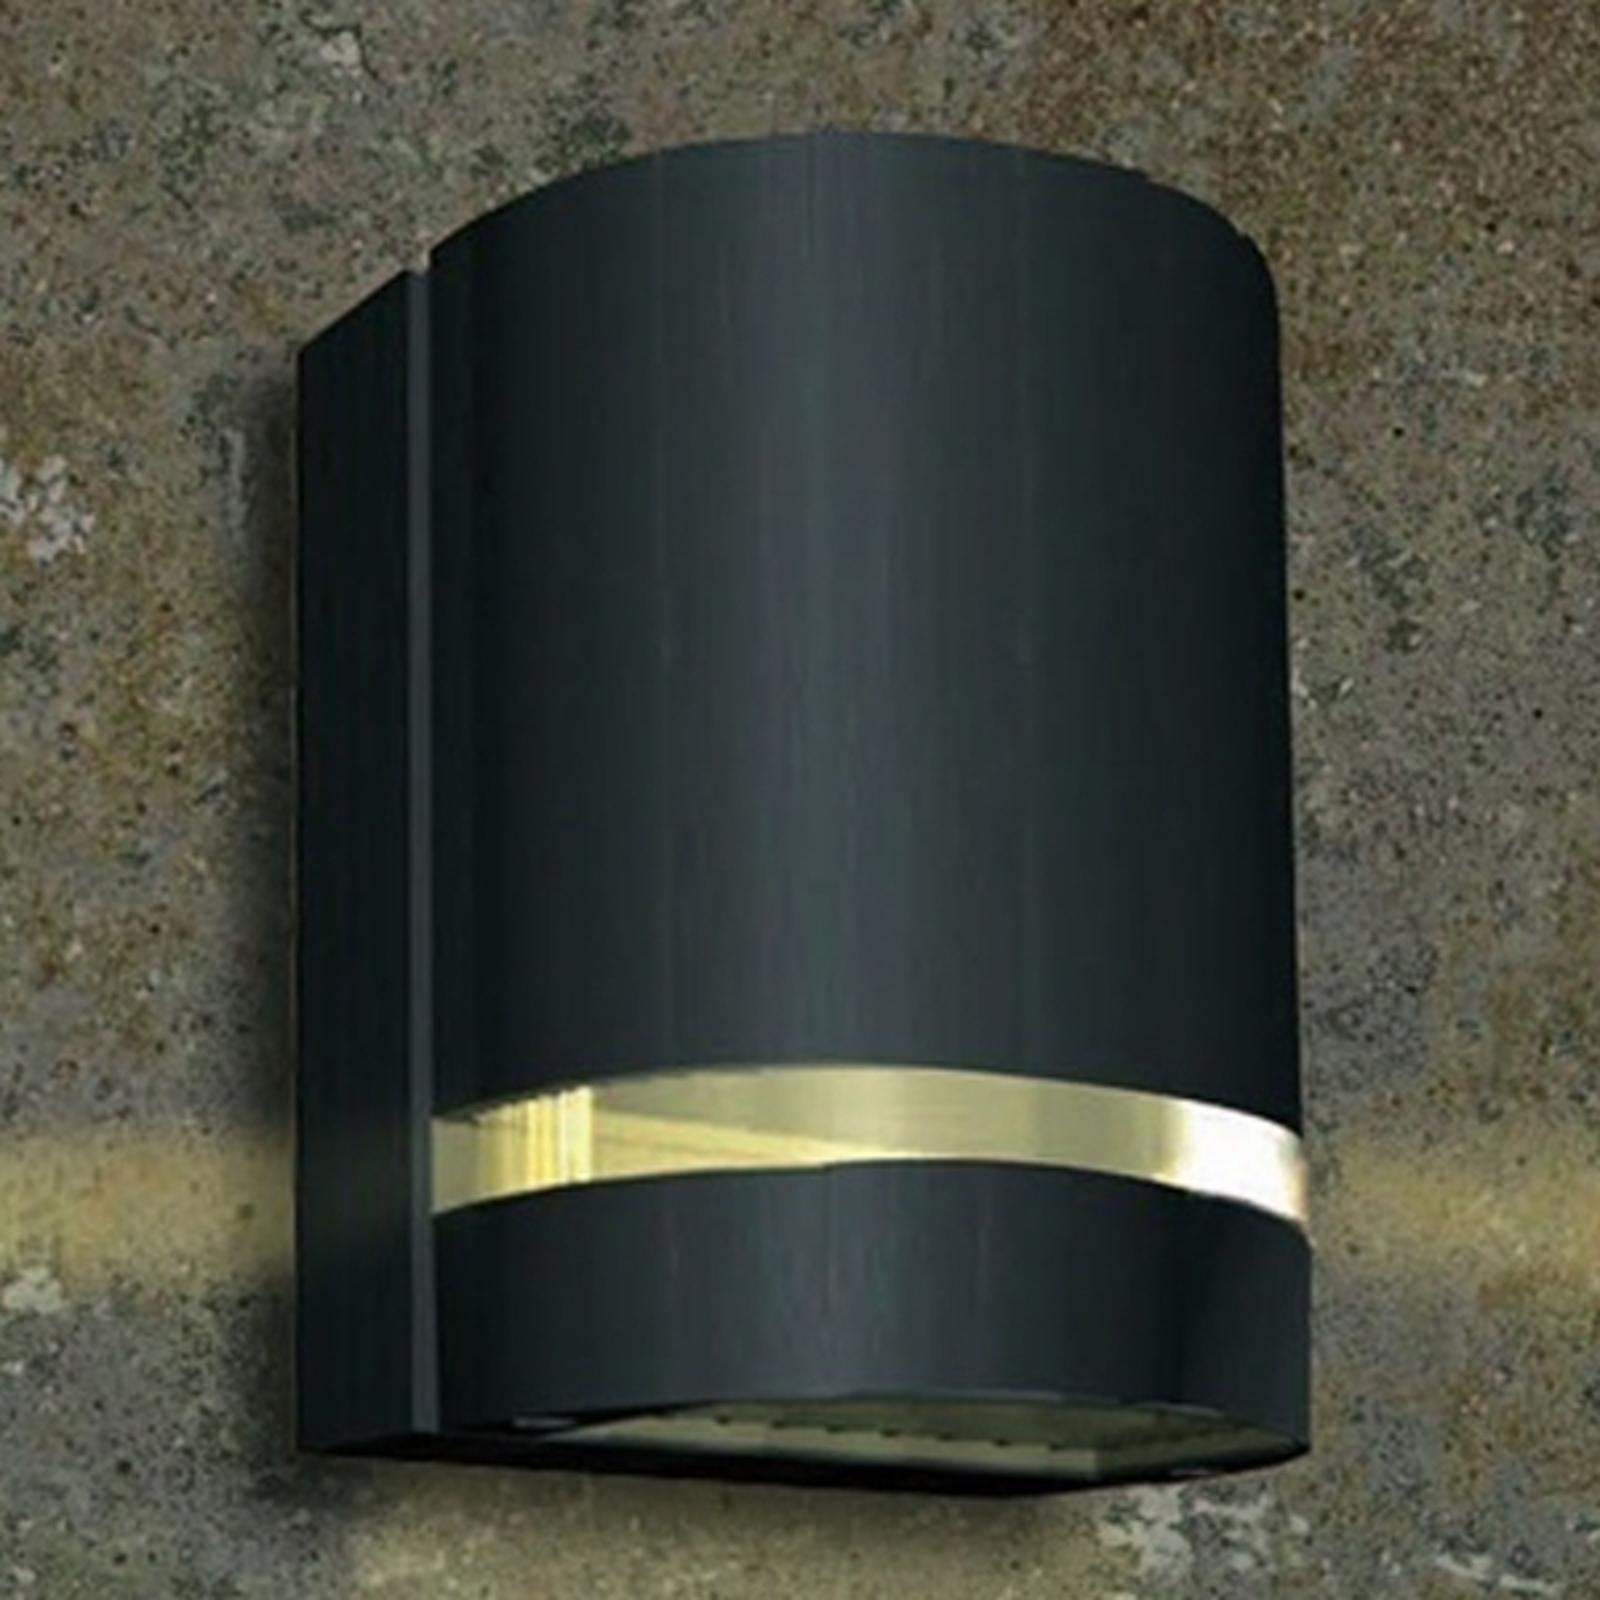 Applique da esterni Focus, a 1 luce antracite